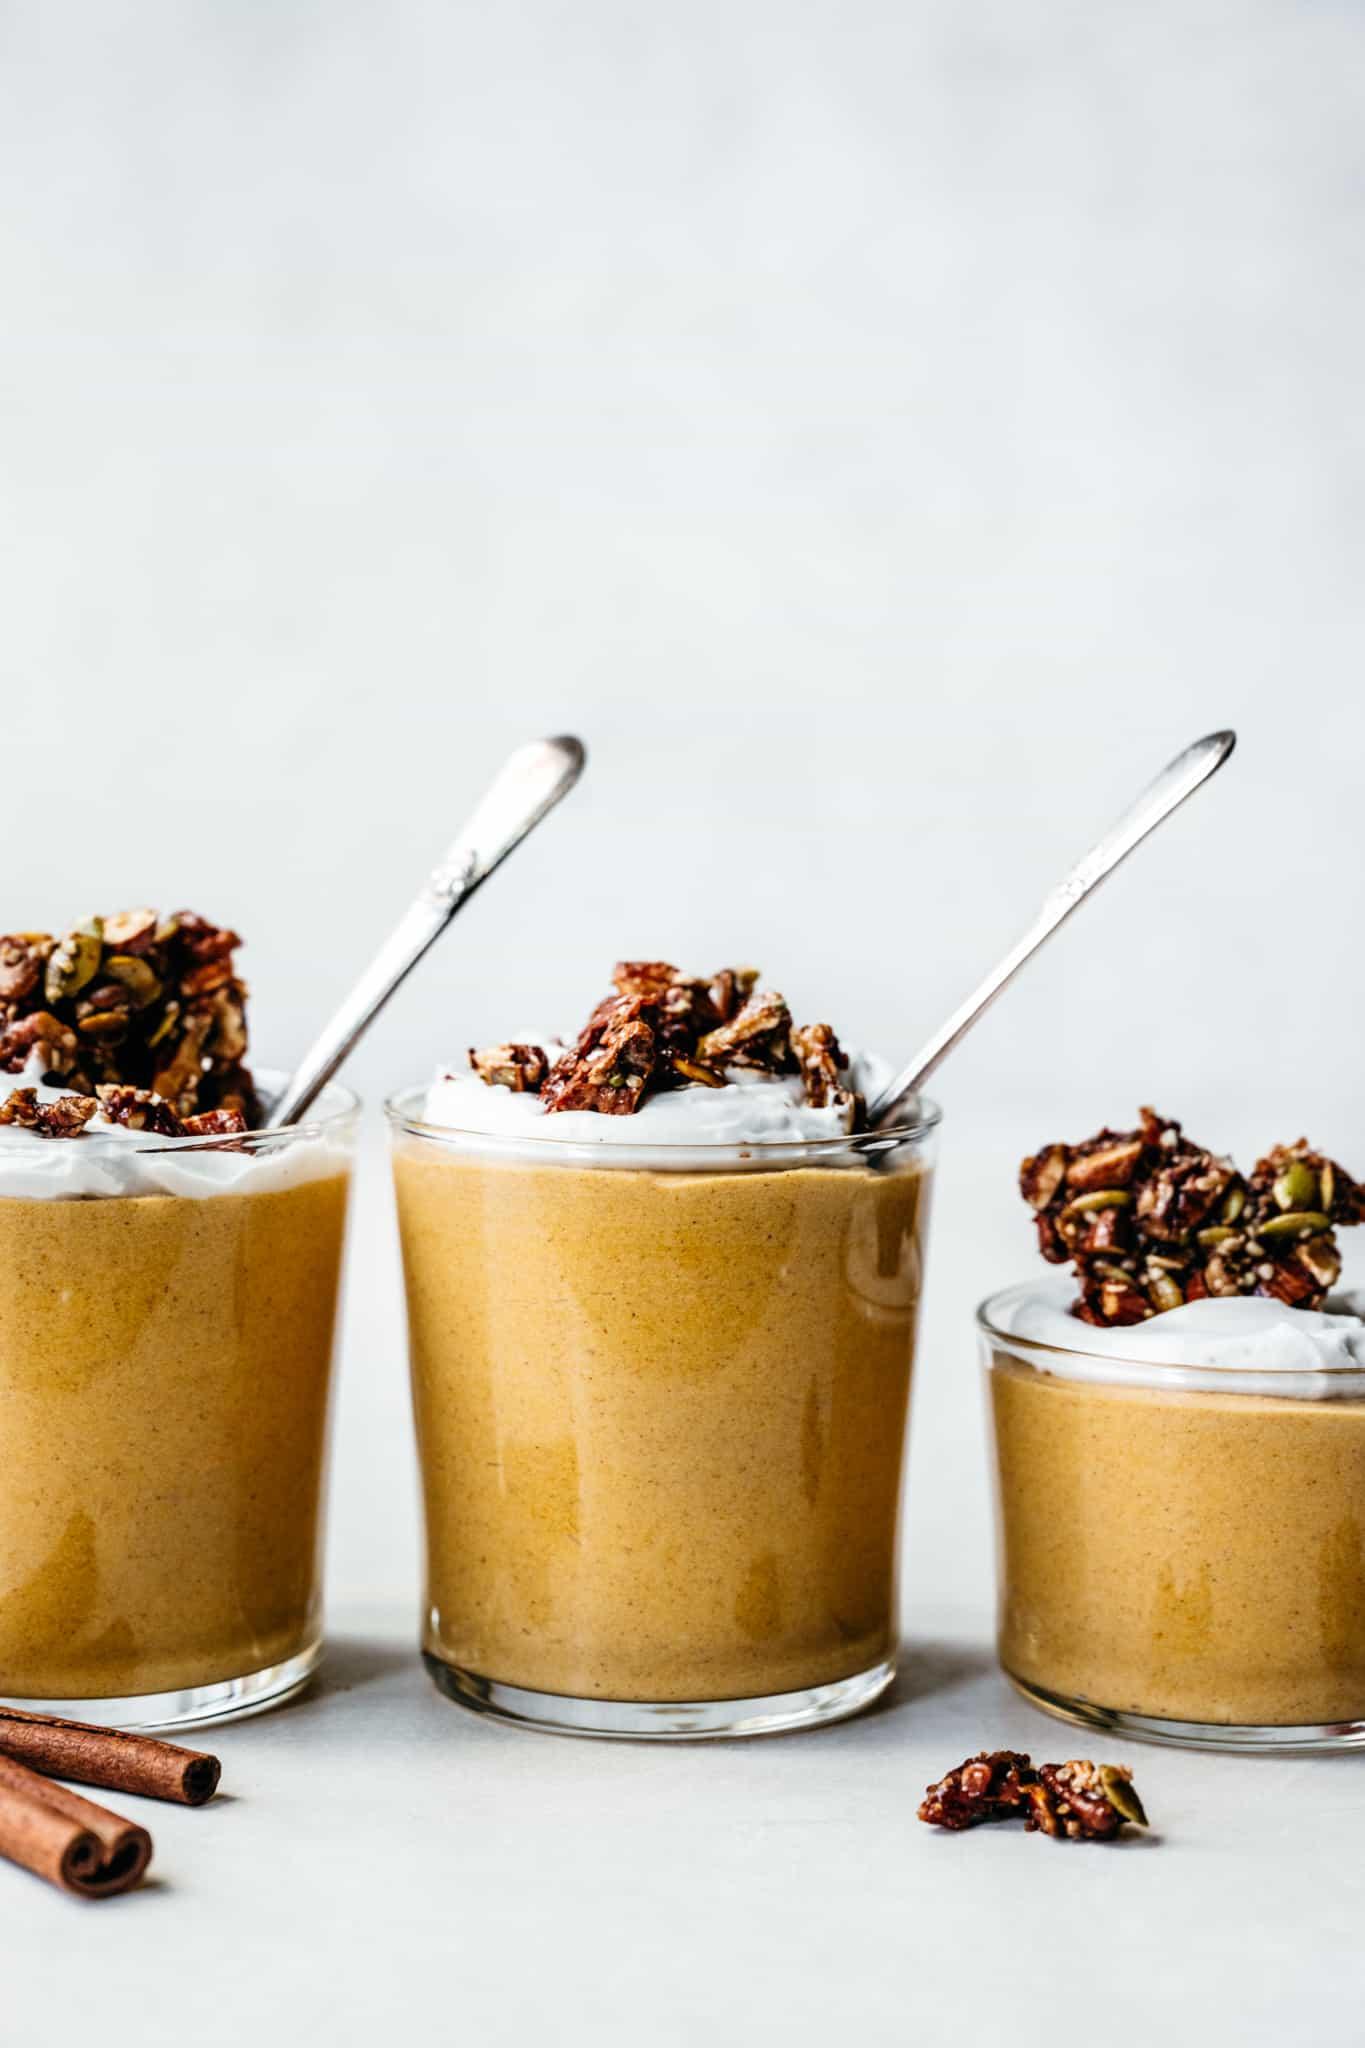 Side view of 3 jars of vegan pumpkin mousse